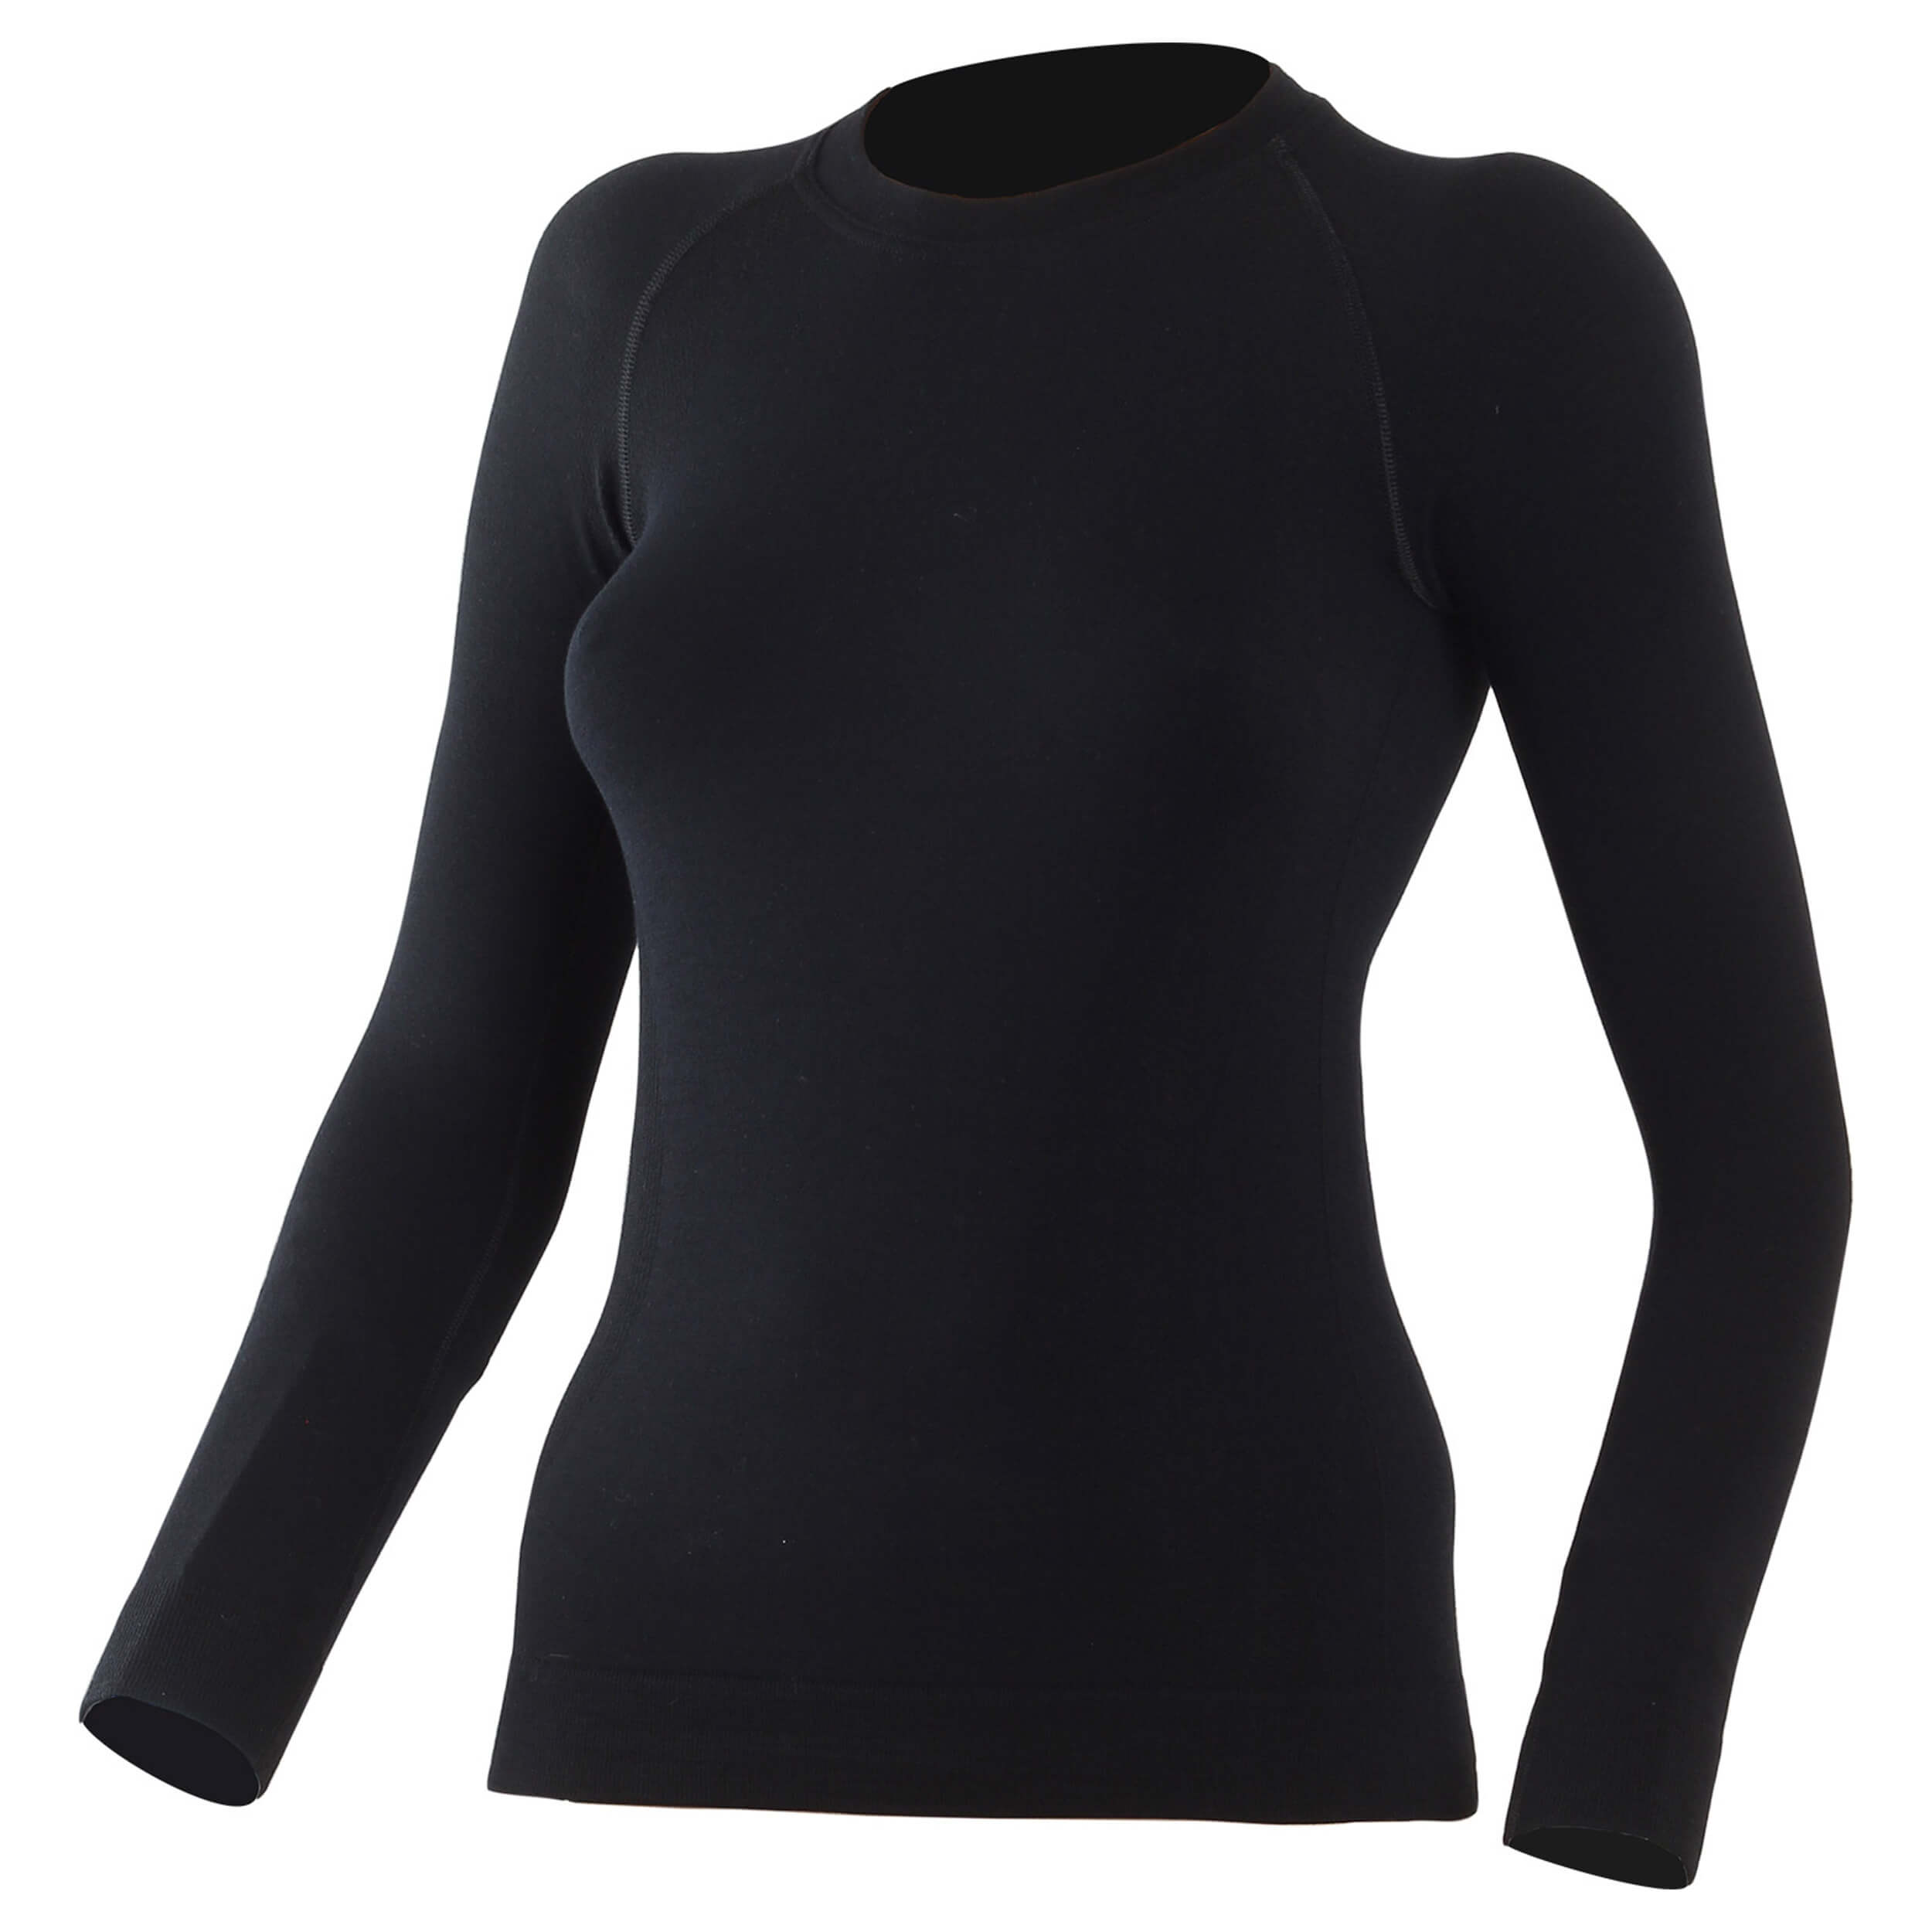 Lasting Merino Seamless WARA Shirt schwarz 200g